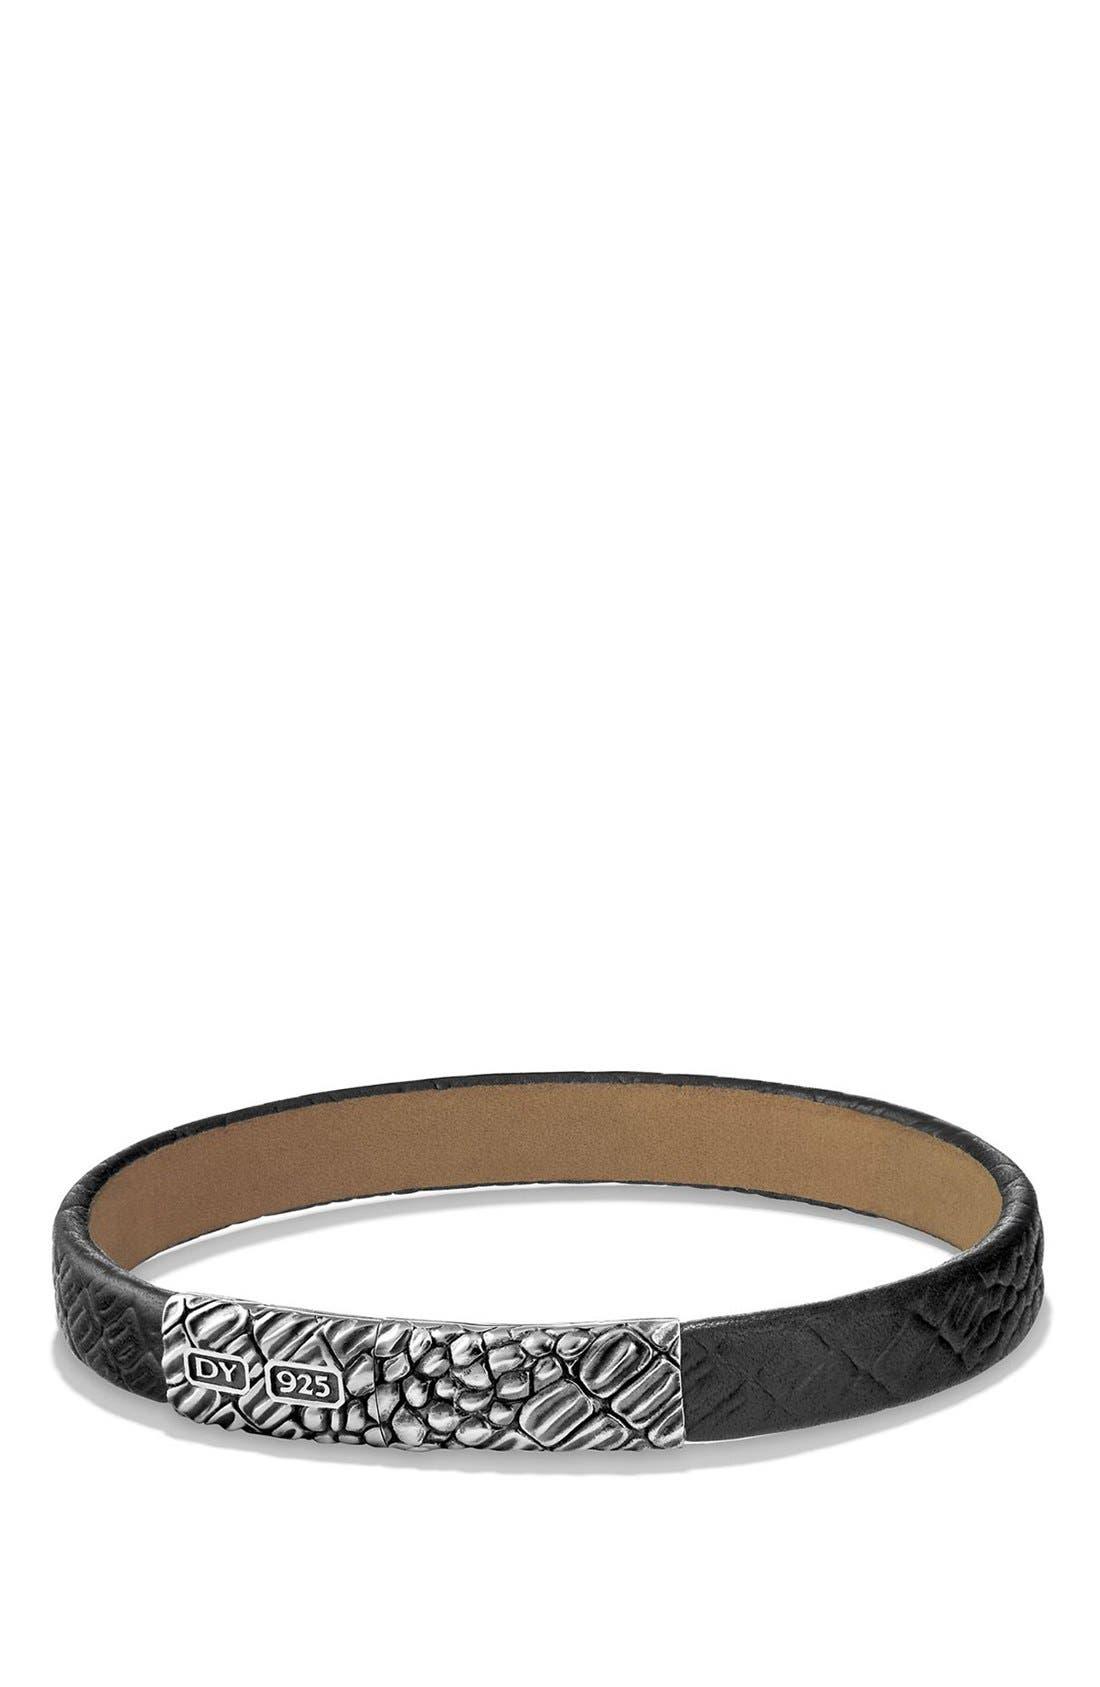 Gator Leather Bracelet,                         Main,                         color, 001